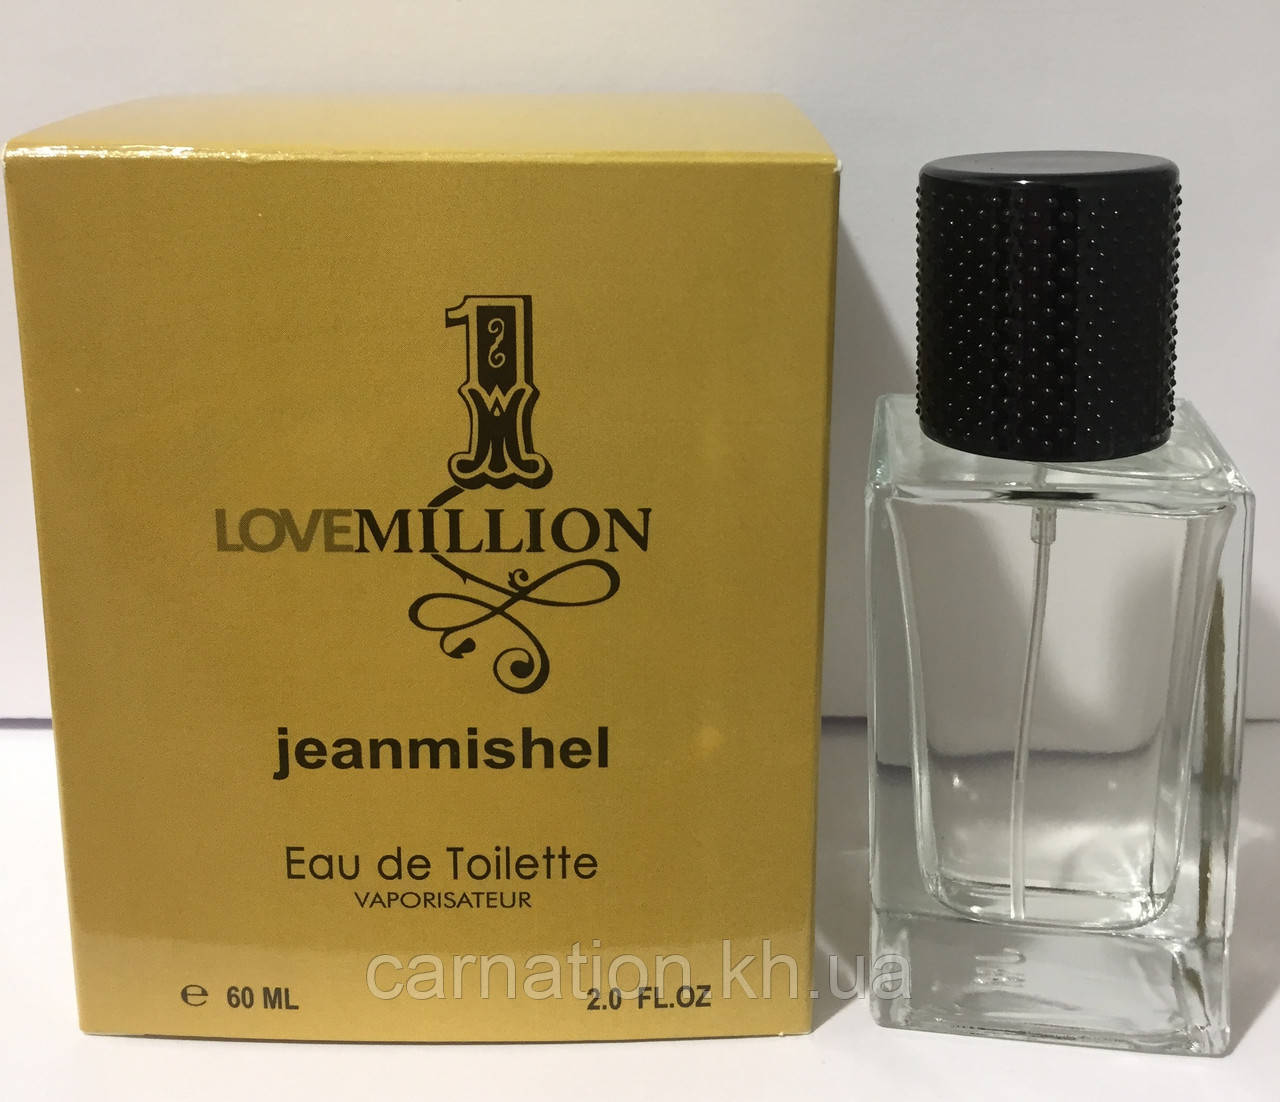 Мужской парфюм Jeanmishel Love 1 Million 60 мл